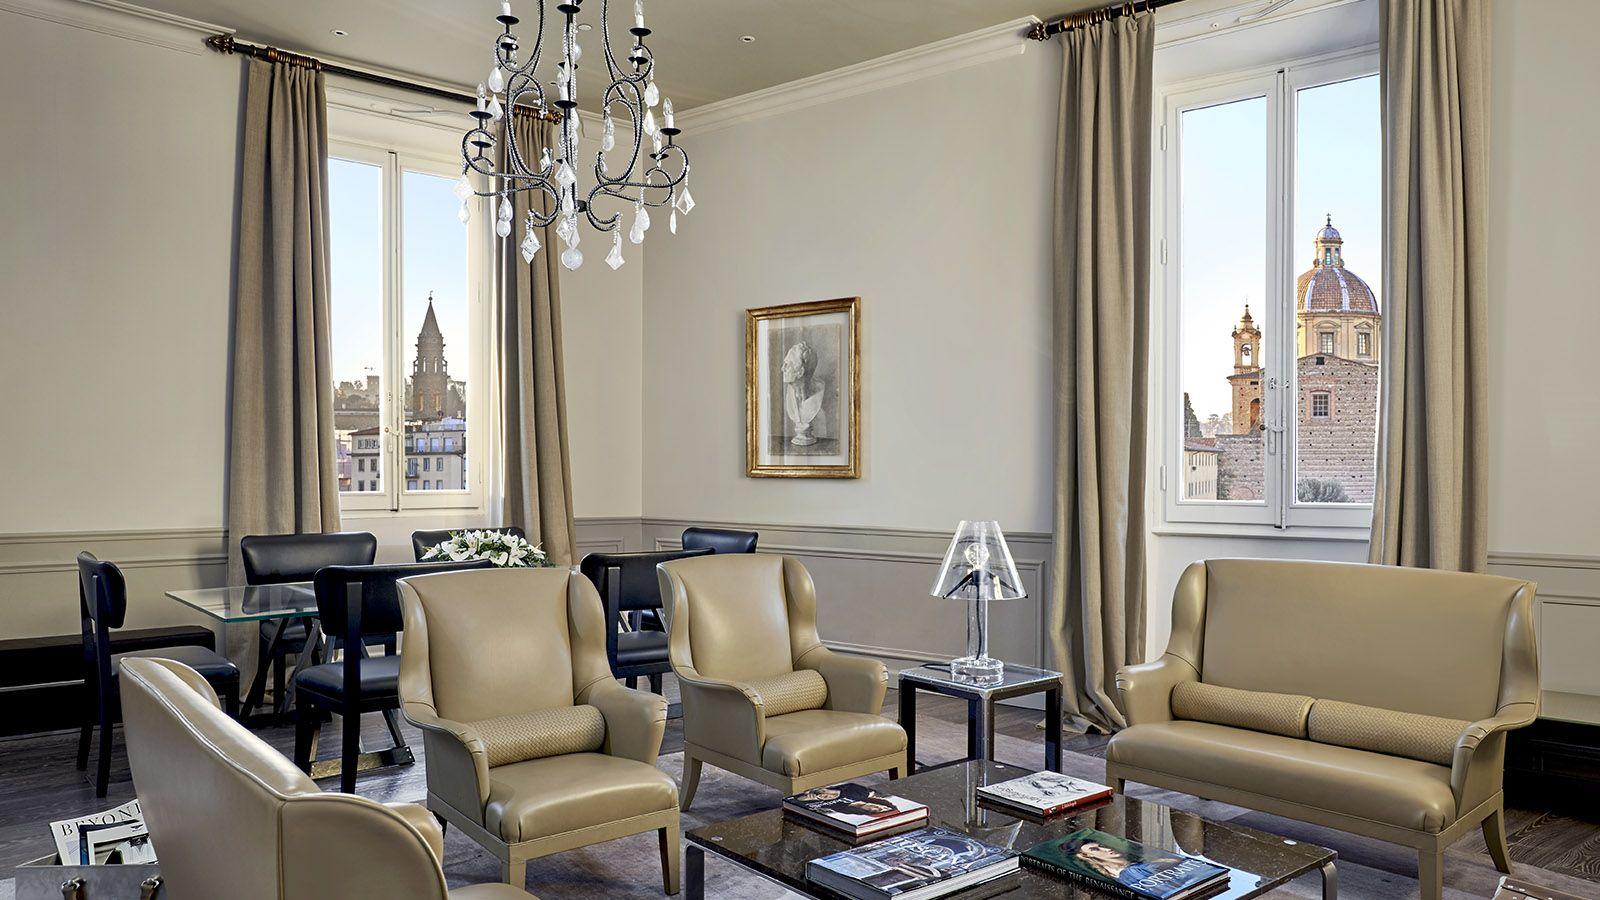 St Regis Florence Opens Up With A Bottega Veneta Suite